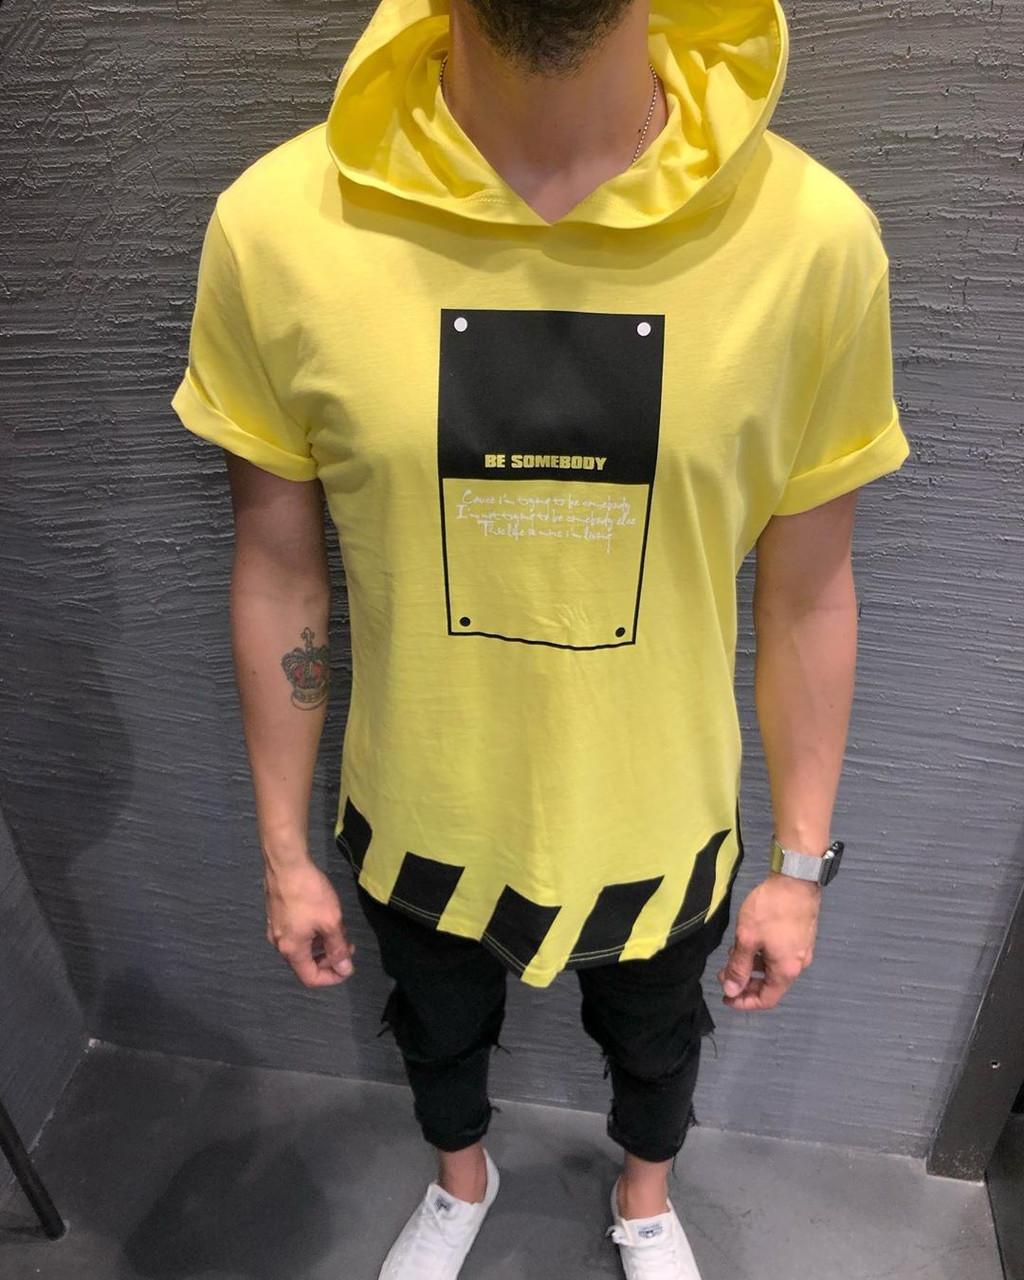 Крутая мужская футболка с капюшоном желтая с черным (Турция) - размеры M, XL, 2XL